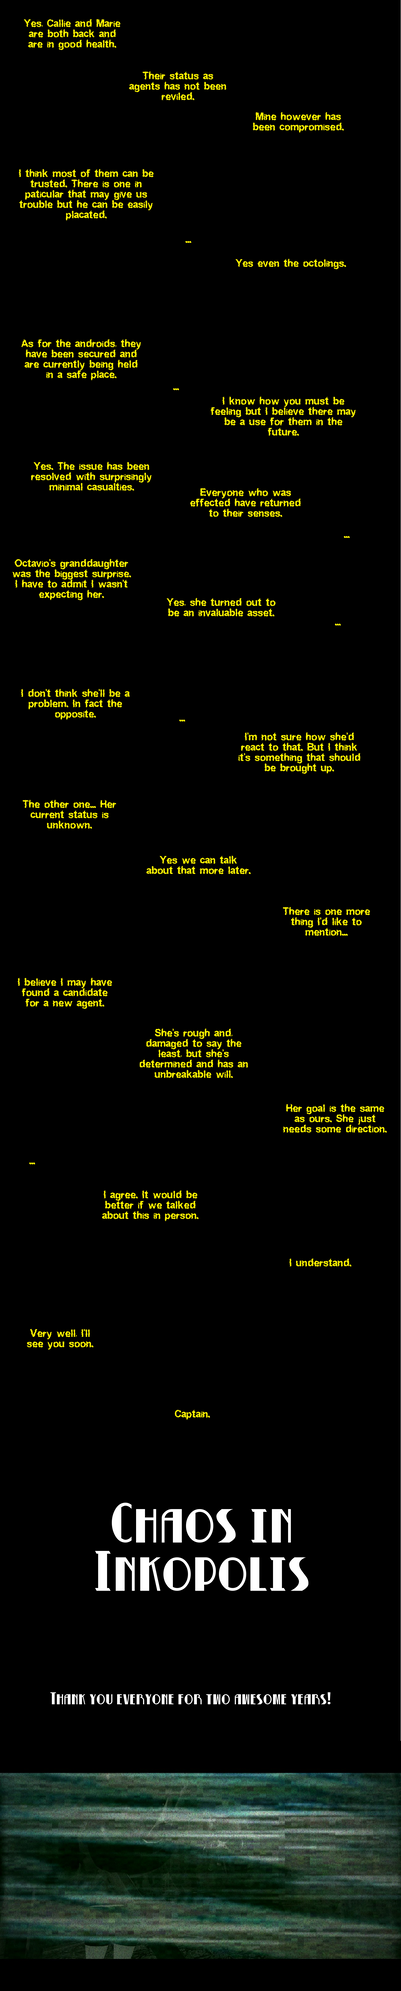 Chaos Epilogue: Mission Report by DarkMario2